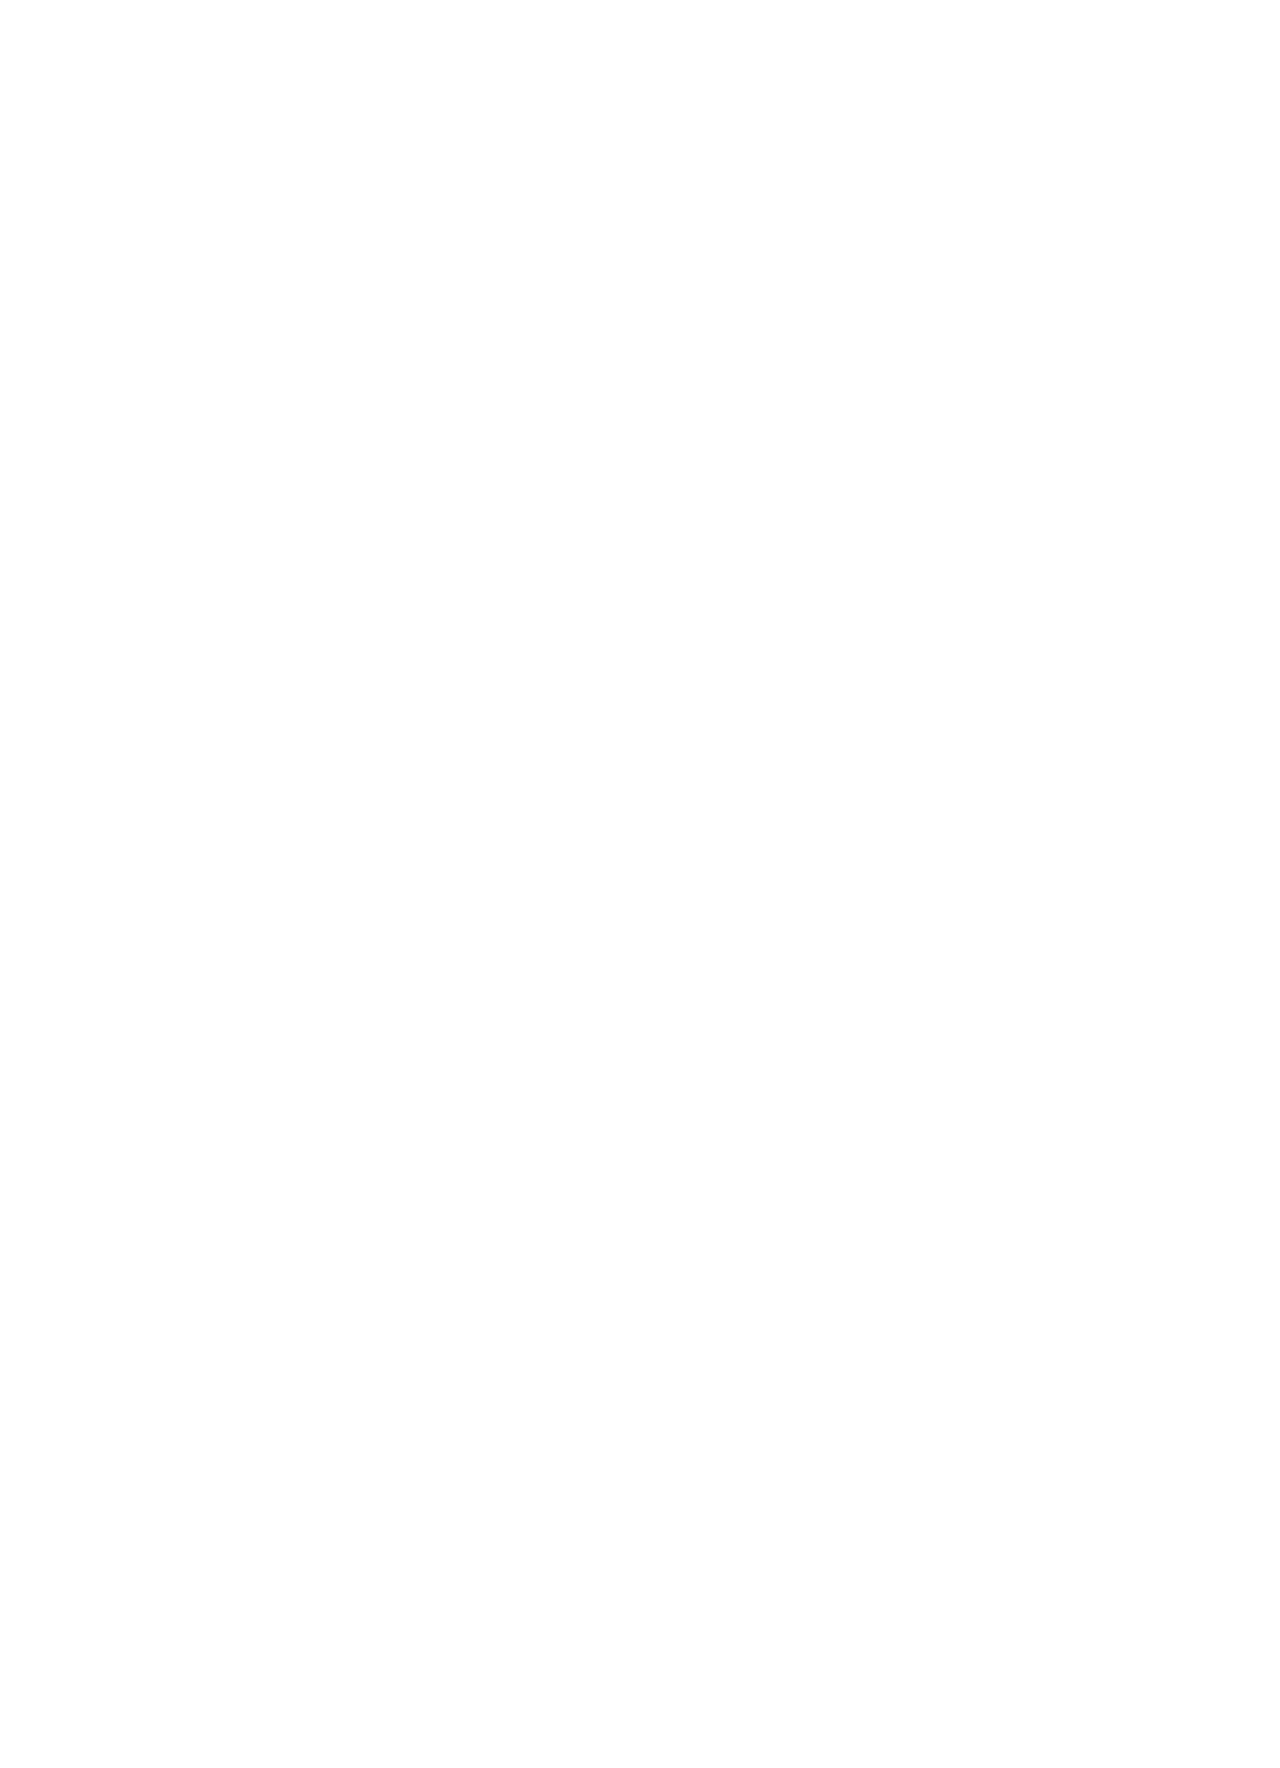 https://digital.tessmann.it/mediaArchive/media/image/Page/BRG/1905/04_10_1905/BRG_1905_10_04_1_object_810112.png?auth=a2e404b94d89c4b1ae49af259d2afebe